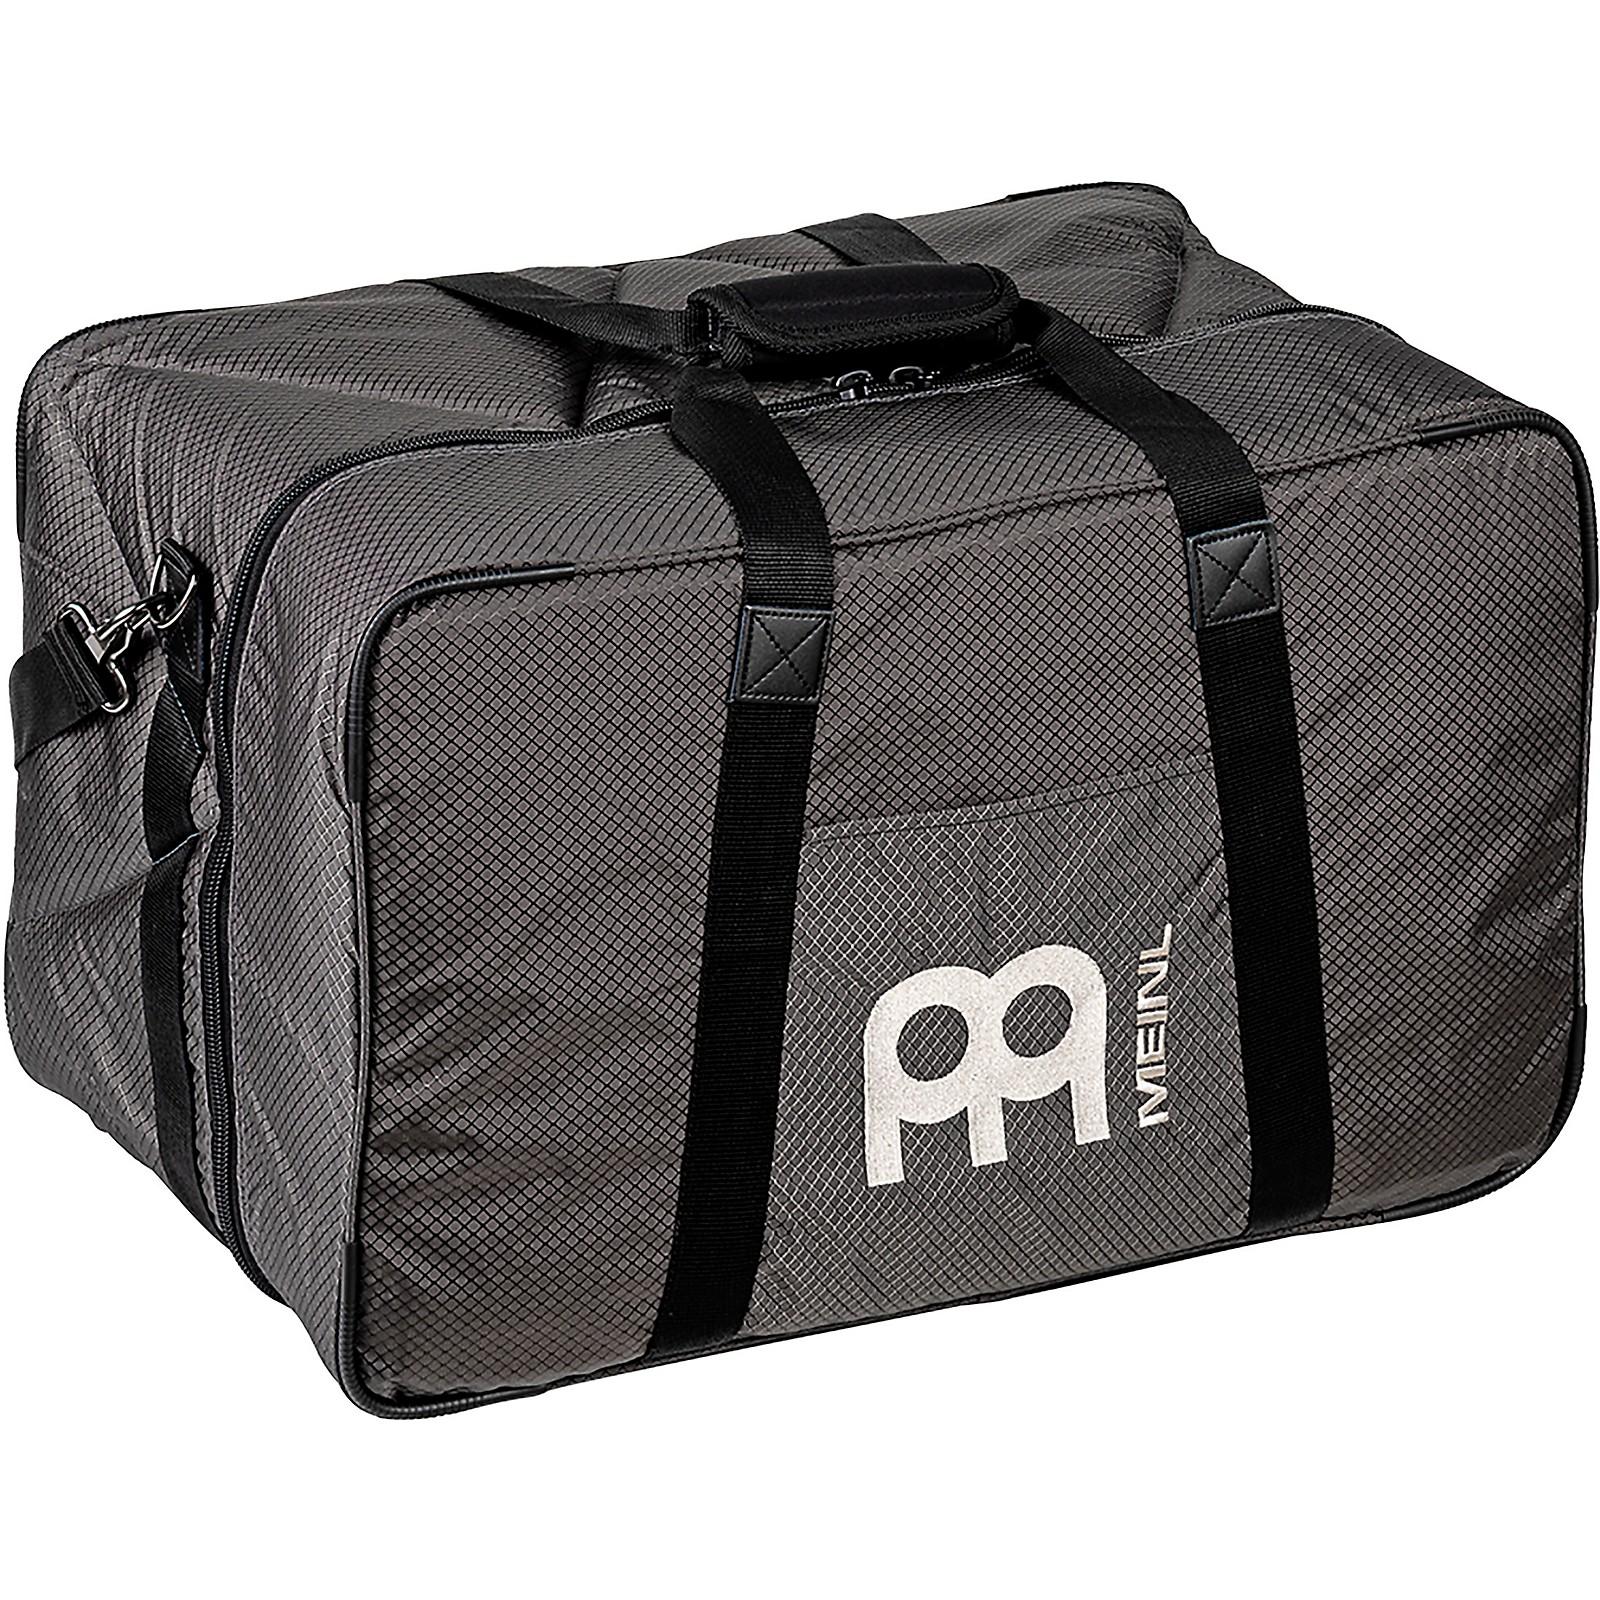 Meinl Professional Ripstop Fabric Cajon Bag